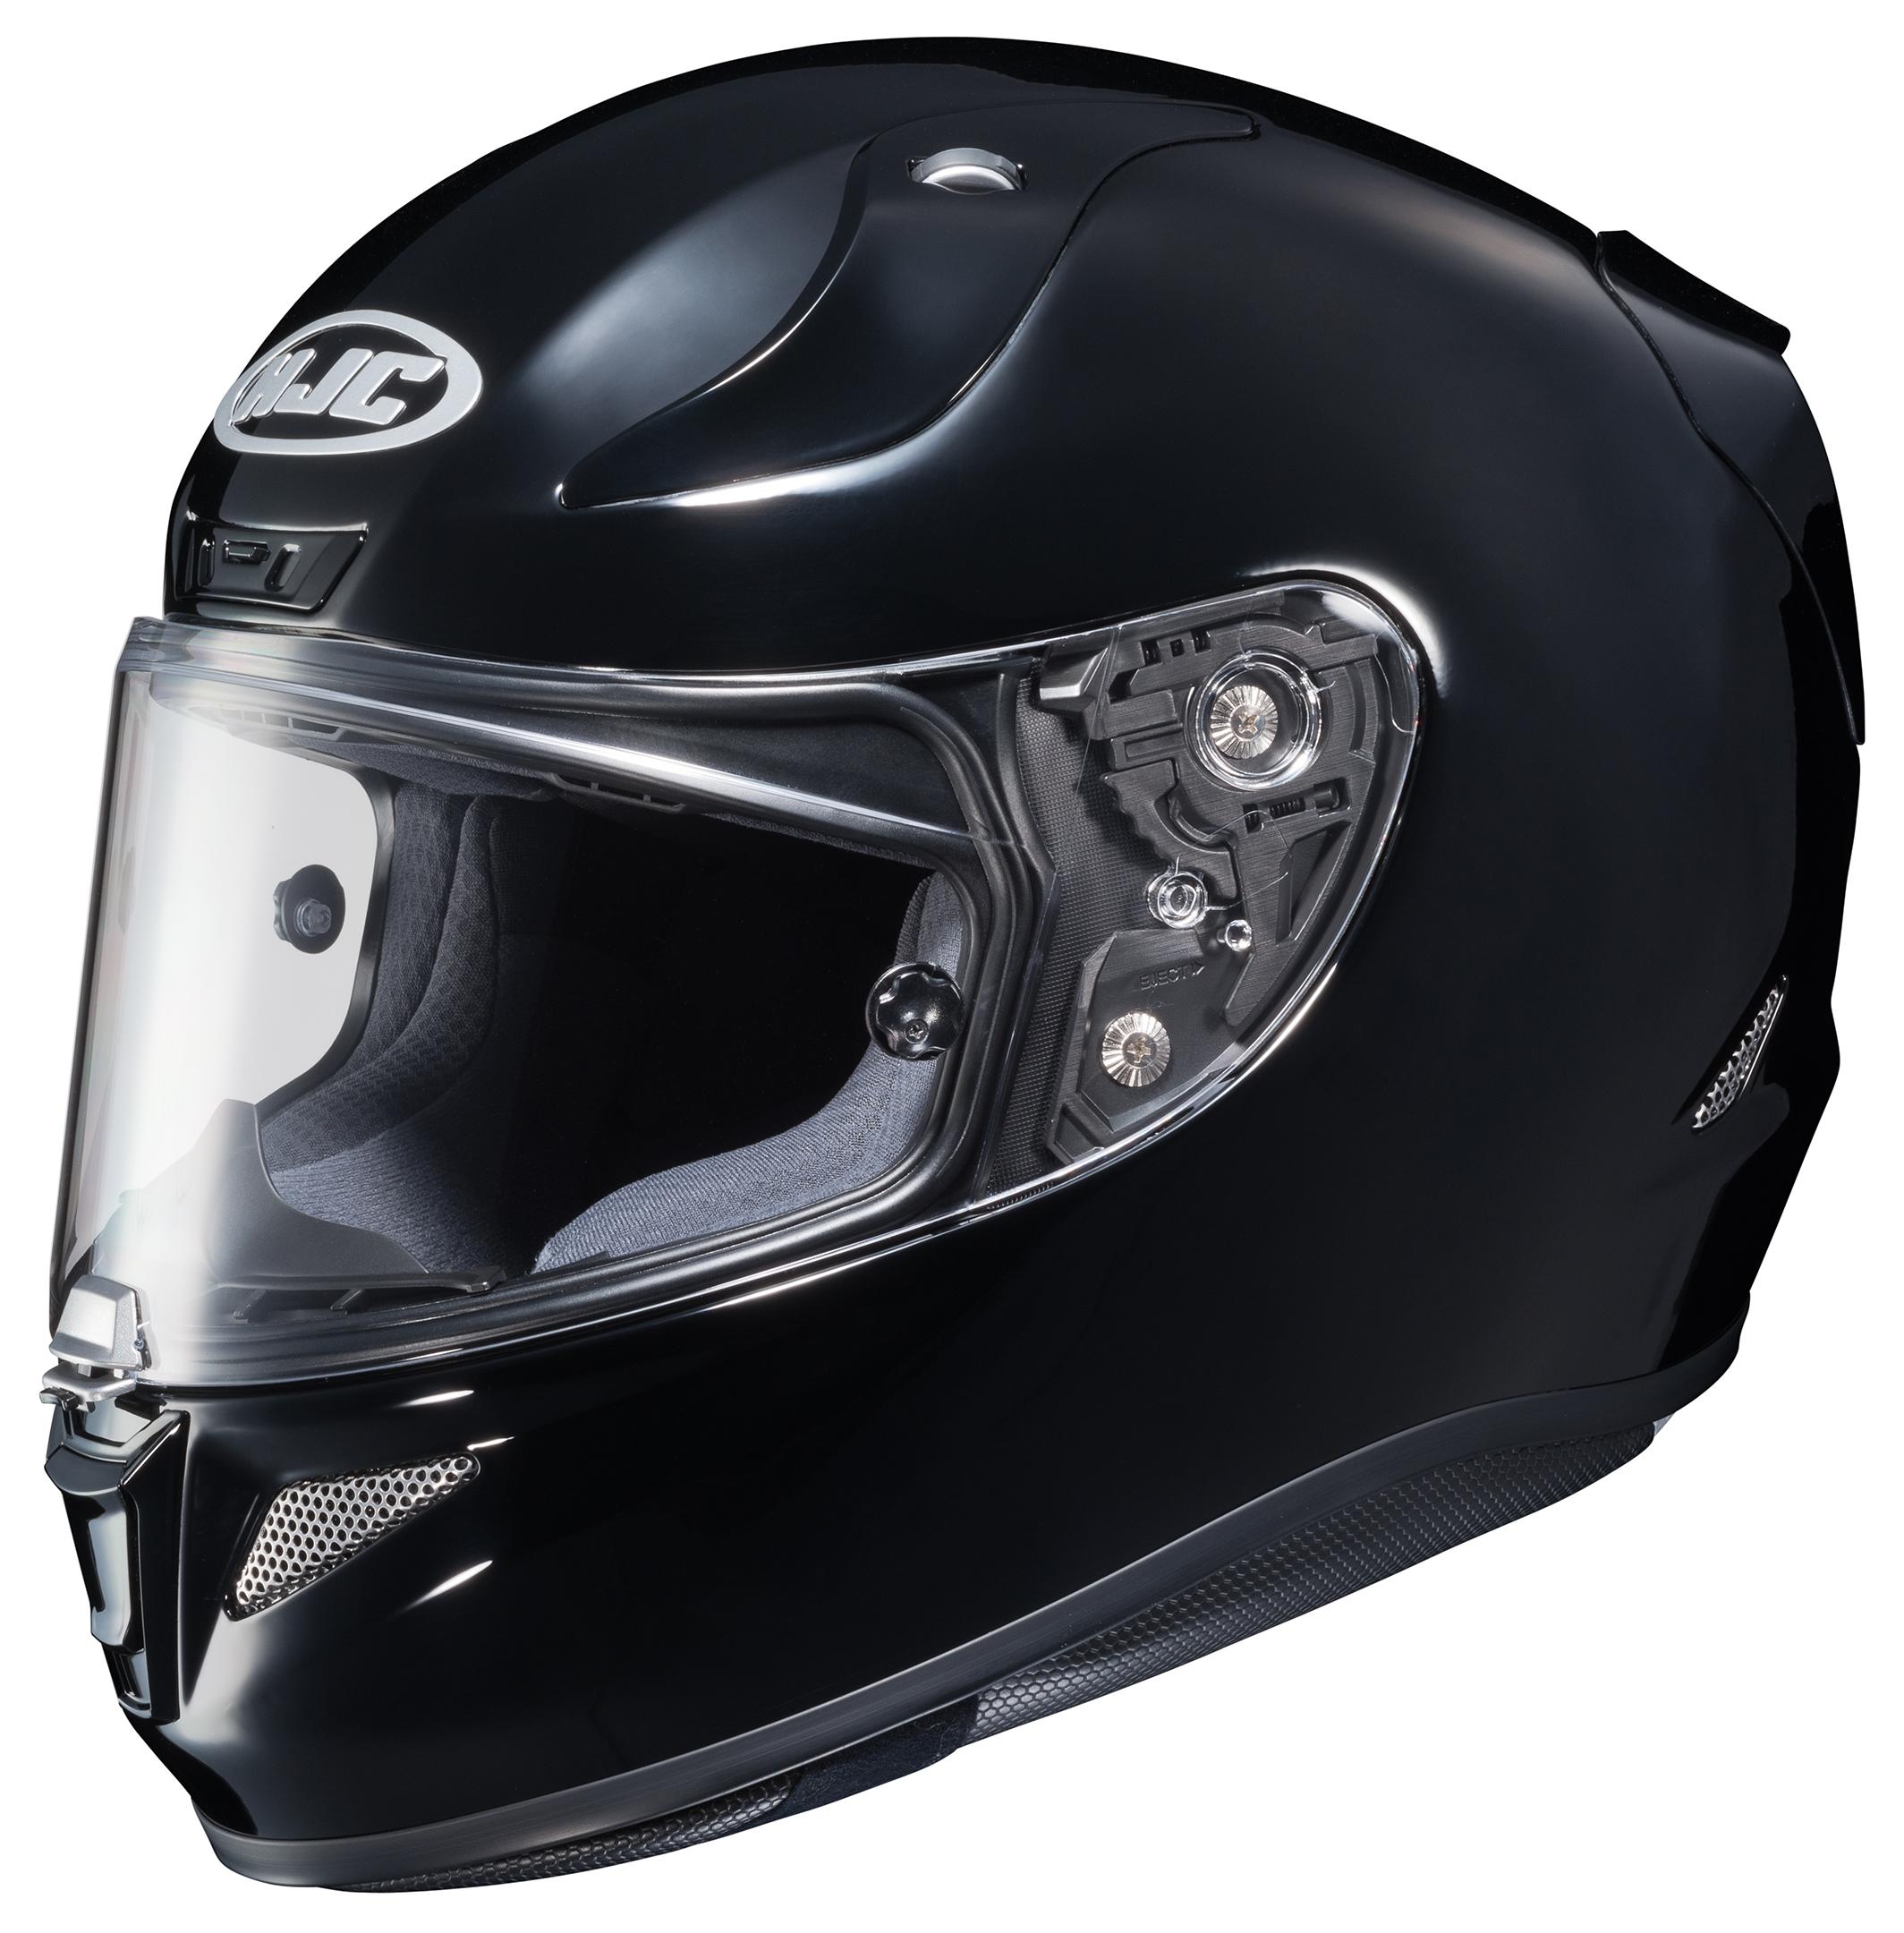 hjc rpha 11 pro helmet revzilla. Black Bedroom Furniture Sets. Home Design Ideas